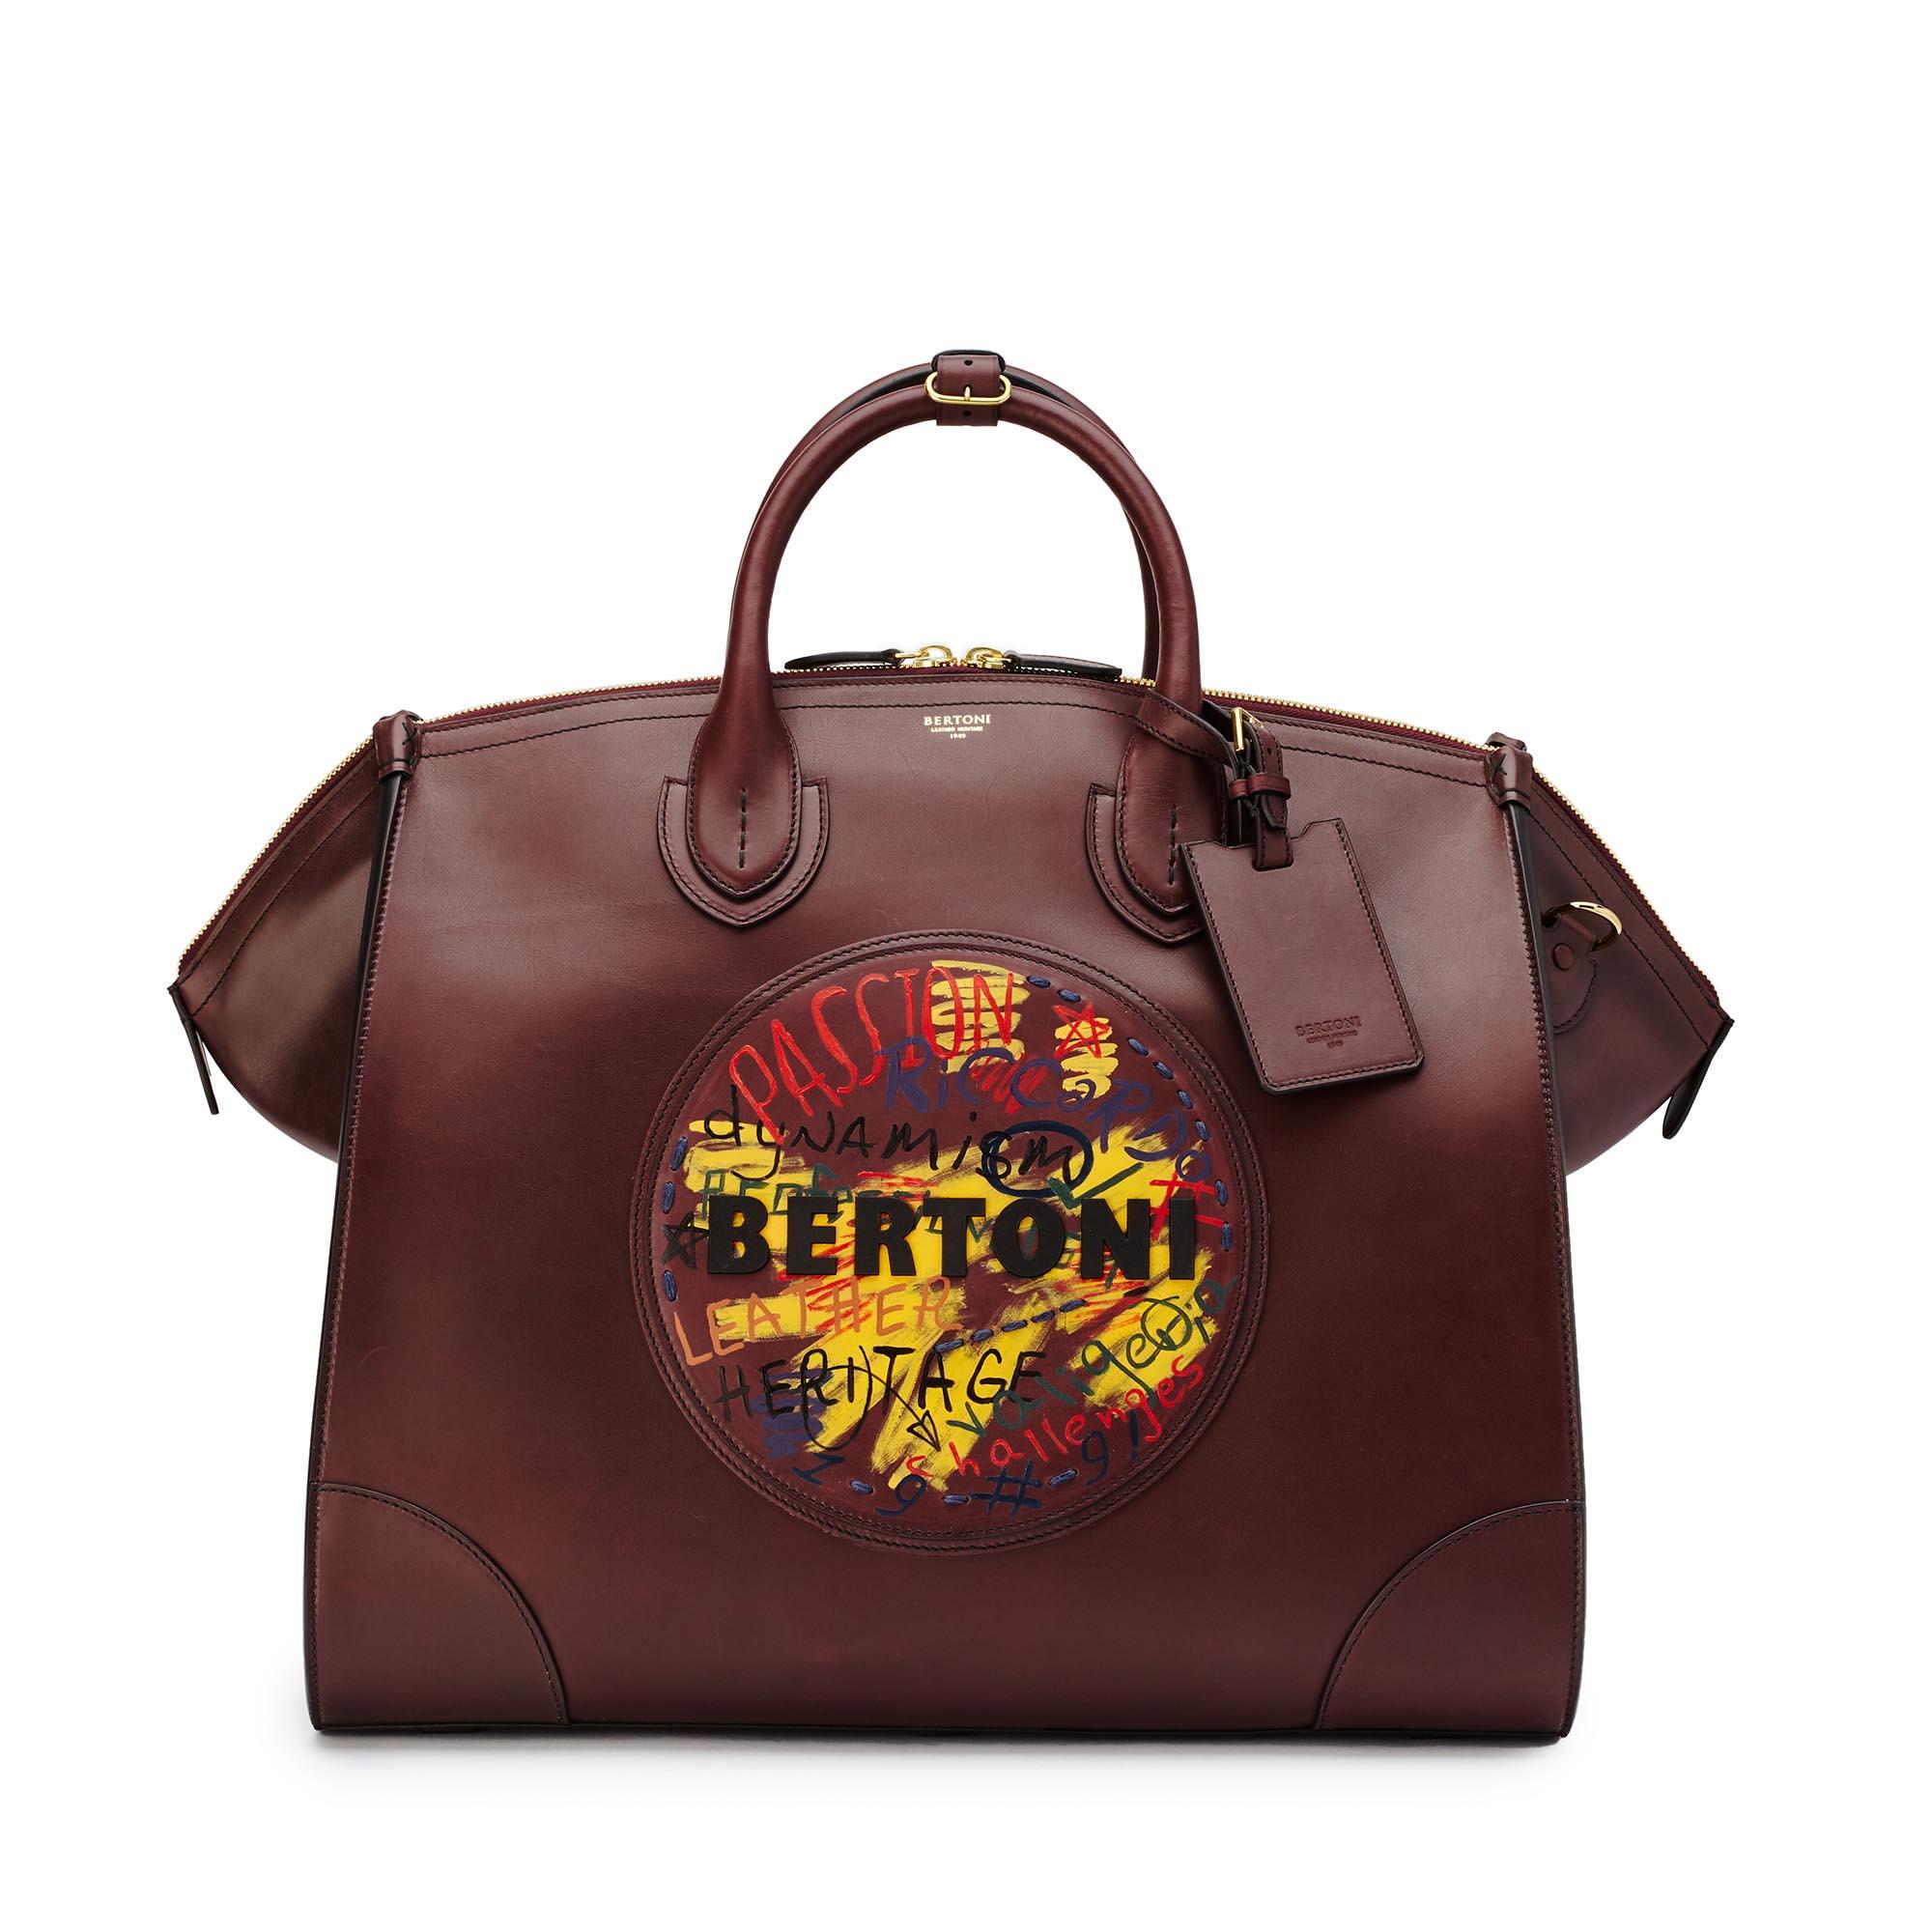 Gulliver-bordeaux-french-calf-bag-Bertoni-1949